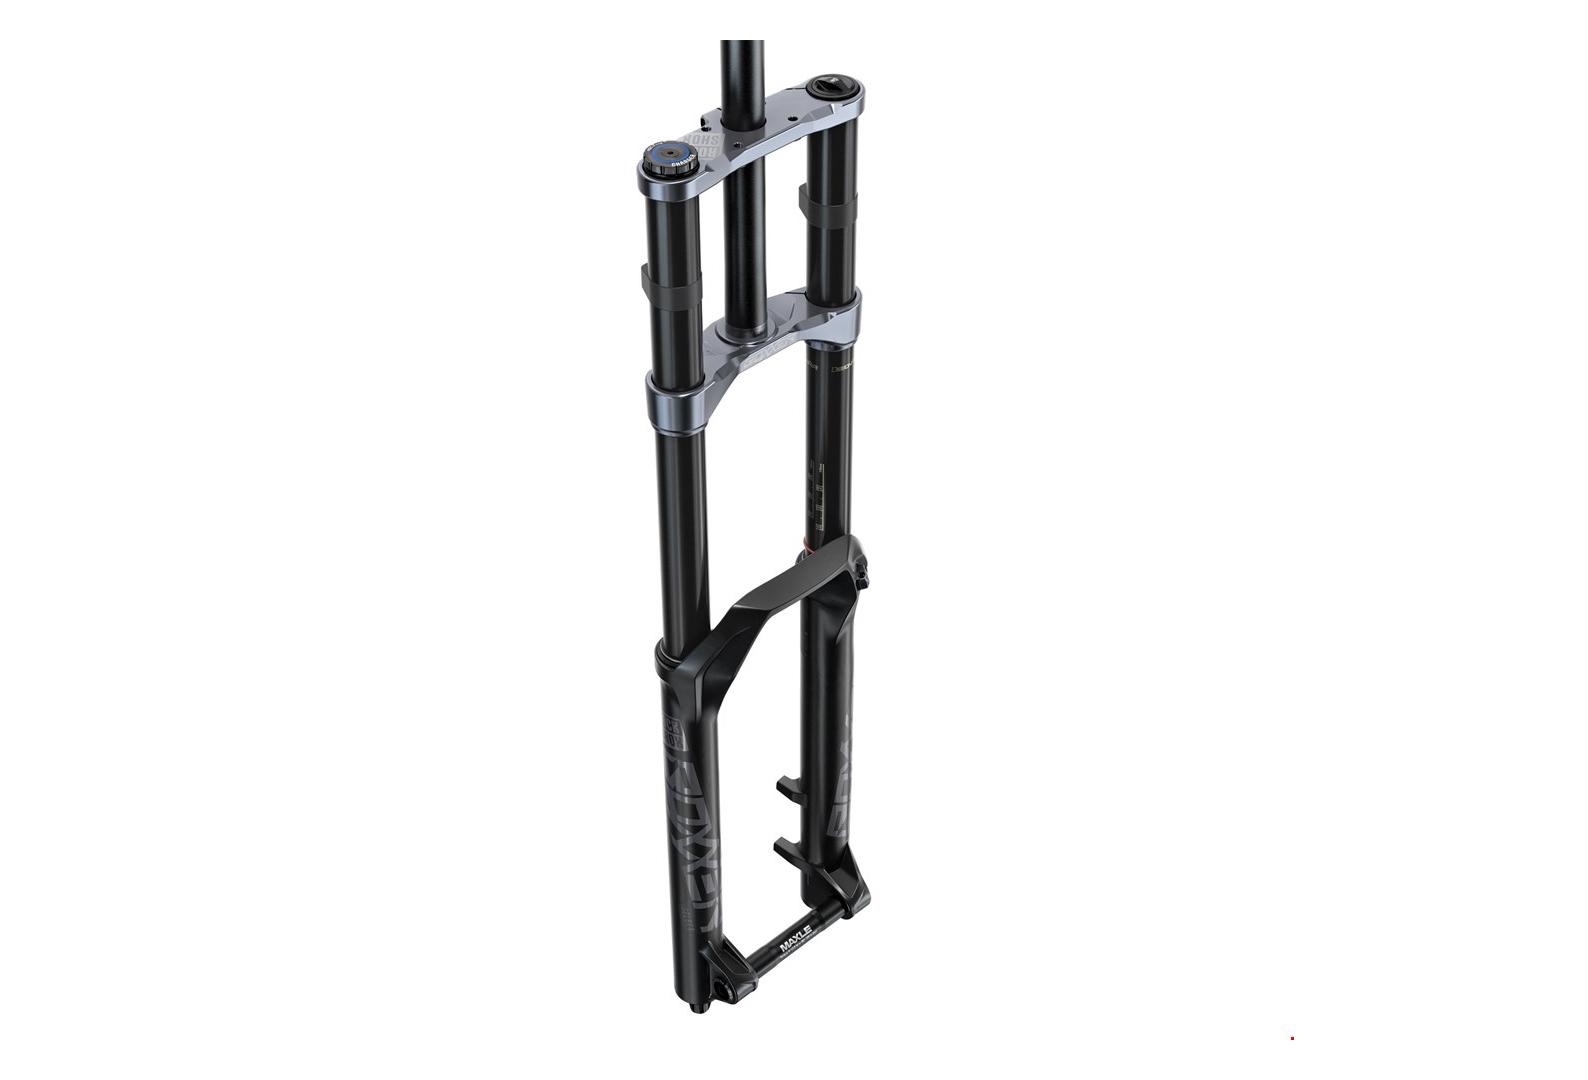 Rockshox BoXXer Fork Select Charger RC DebonAir 27 5 '' | Boost 20x110mm |  Offset 36 | Black 2020